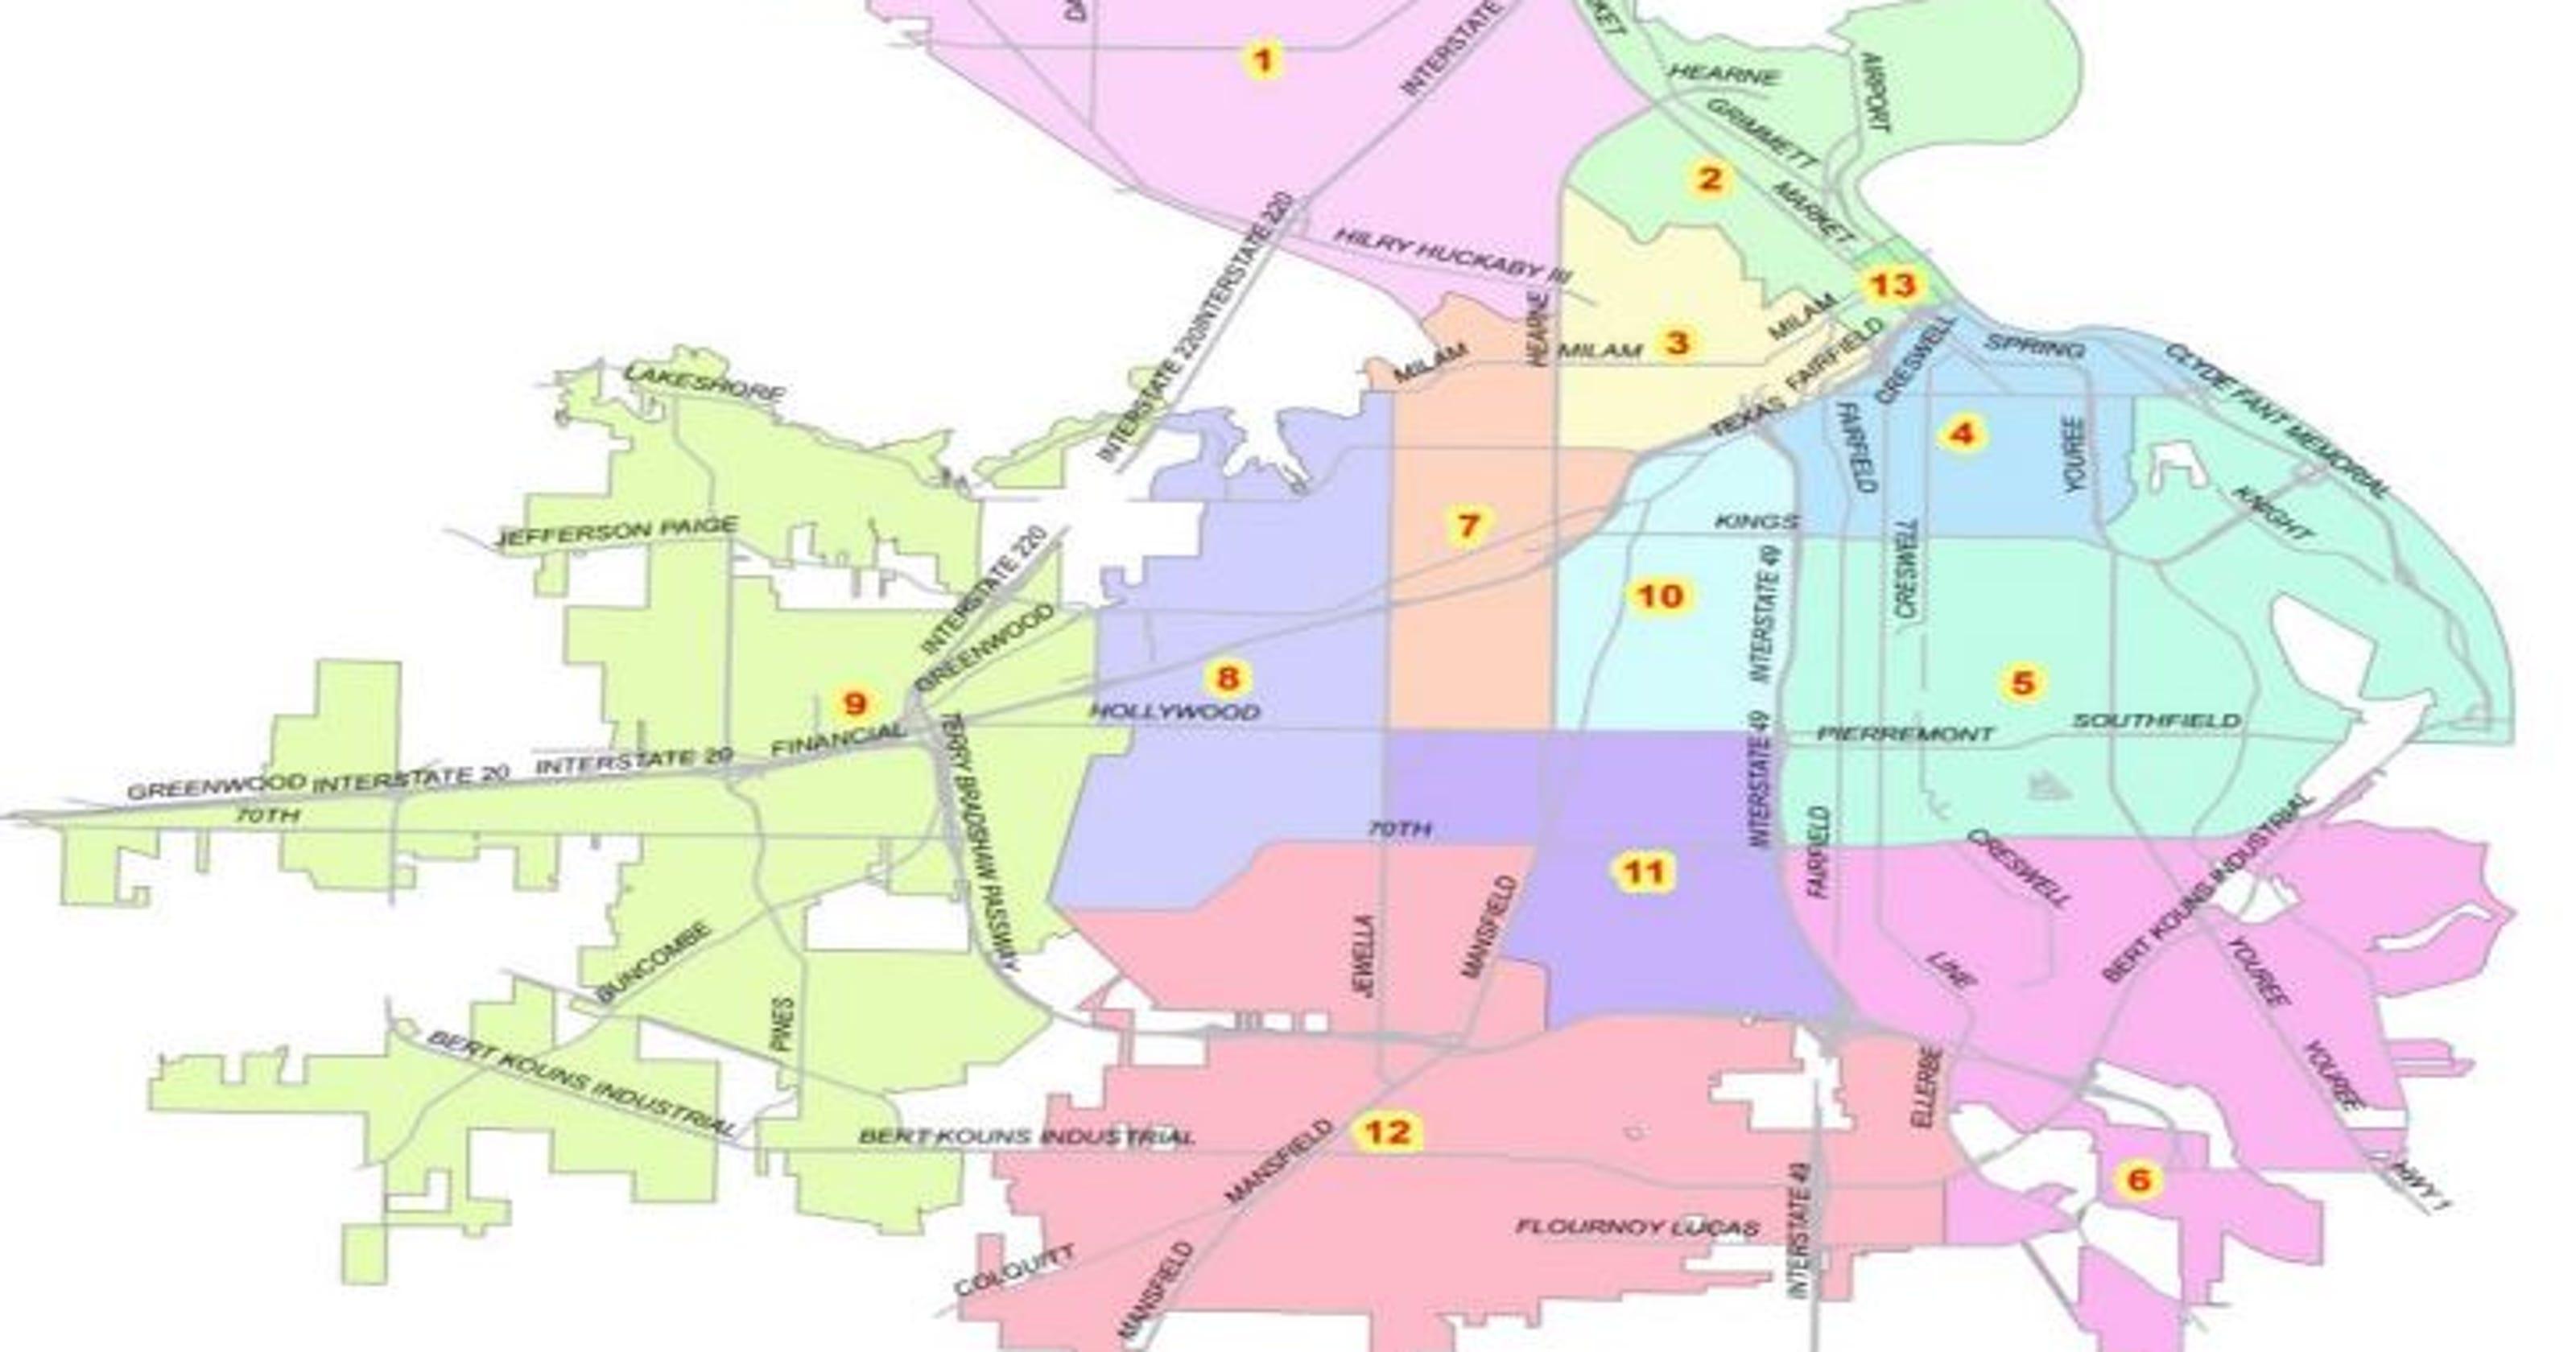 What's the safest neighborhood in Shreveport? on detailed map of los angeles county cities map, shreveport airport map, shreveport boardwalk, shreveport to houston, shreveport i-49 corridor, louisiana map, downtown shreveport map, st. john the baptist parish map, shreveport il map, las vegas nv map, bienville square map, torrance ca on map, shreveport neighborhood, shreveport louisiana, shreveport riverwalk, shreveport nightlife, shreveport bossier city attractions, shreveport zip code map, shreveport churches, shreveport library,